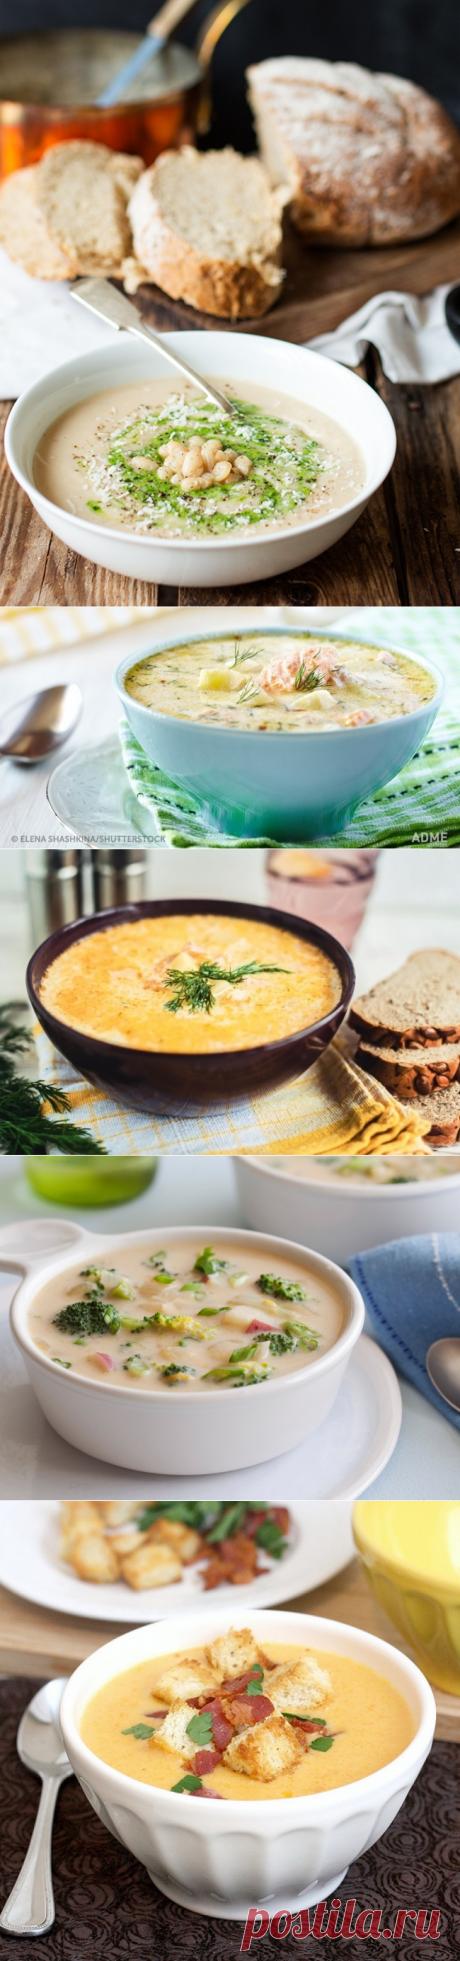 7 vkusnyuschih de crema supchikov